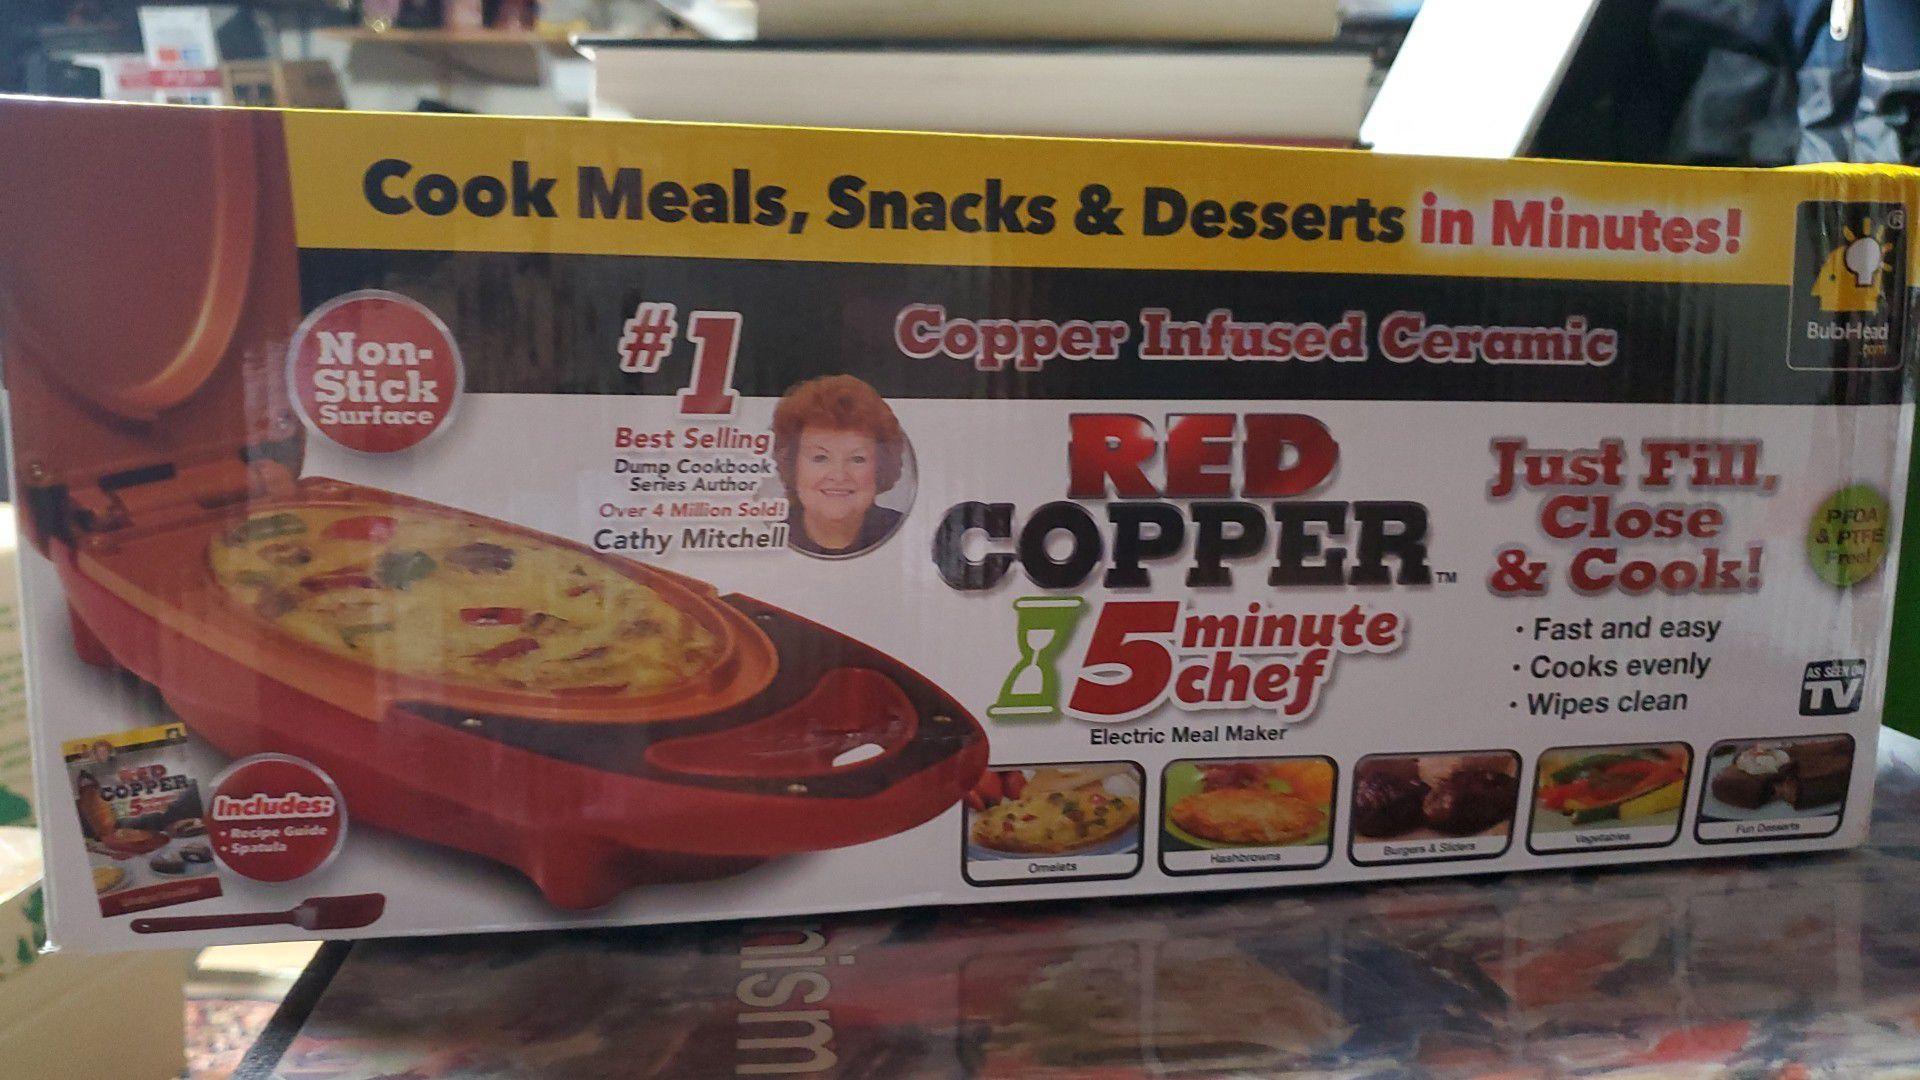 Red copper ceramic chef